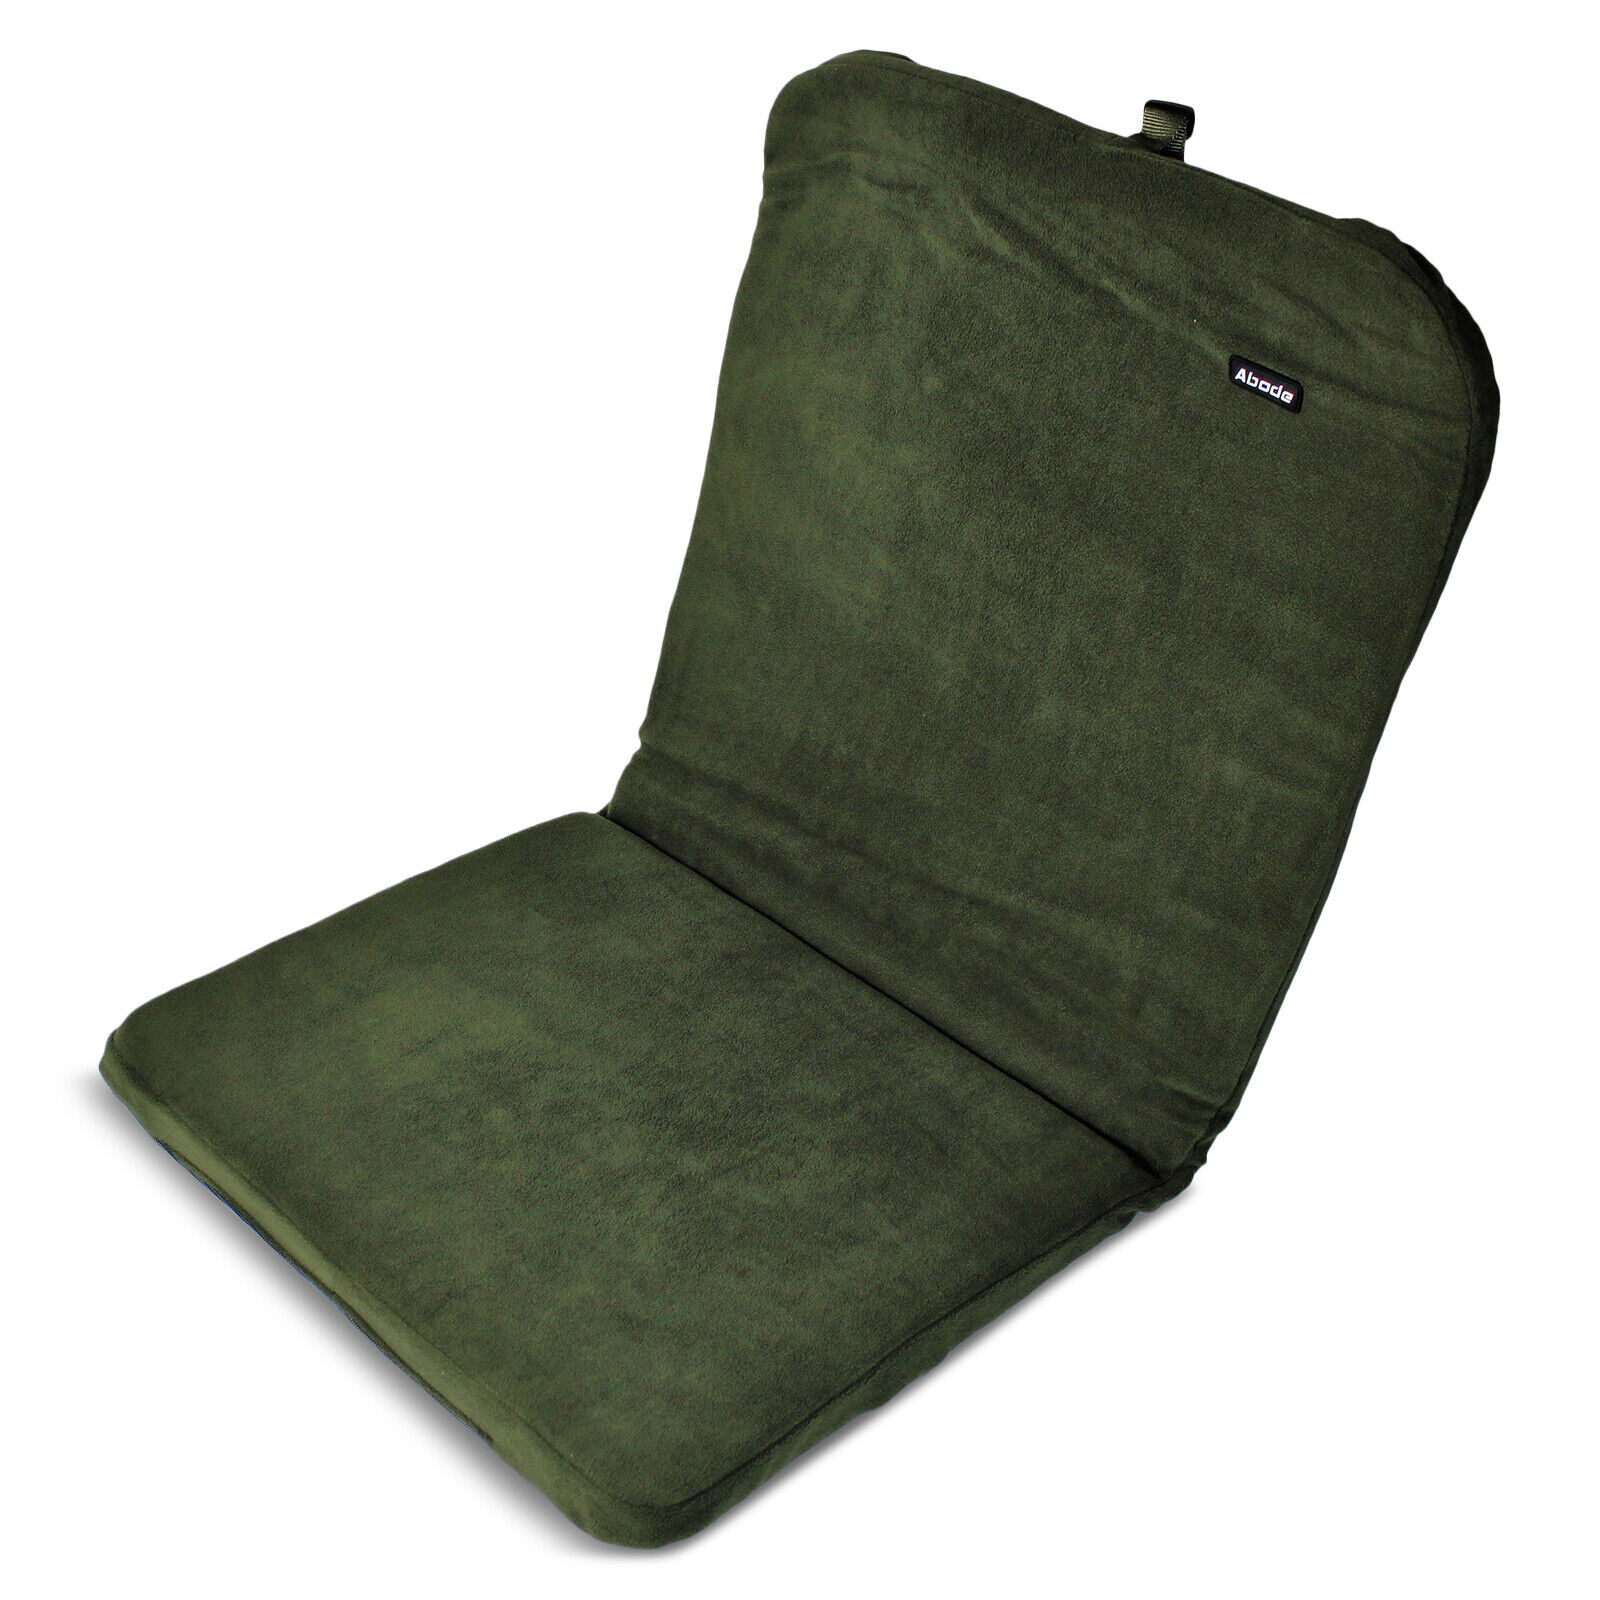 Abode Memory Foam chair Mattress Topper Carp Fishing Camping Cover